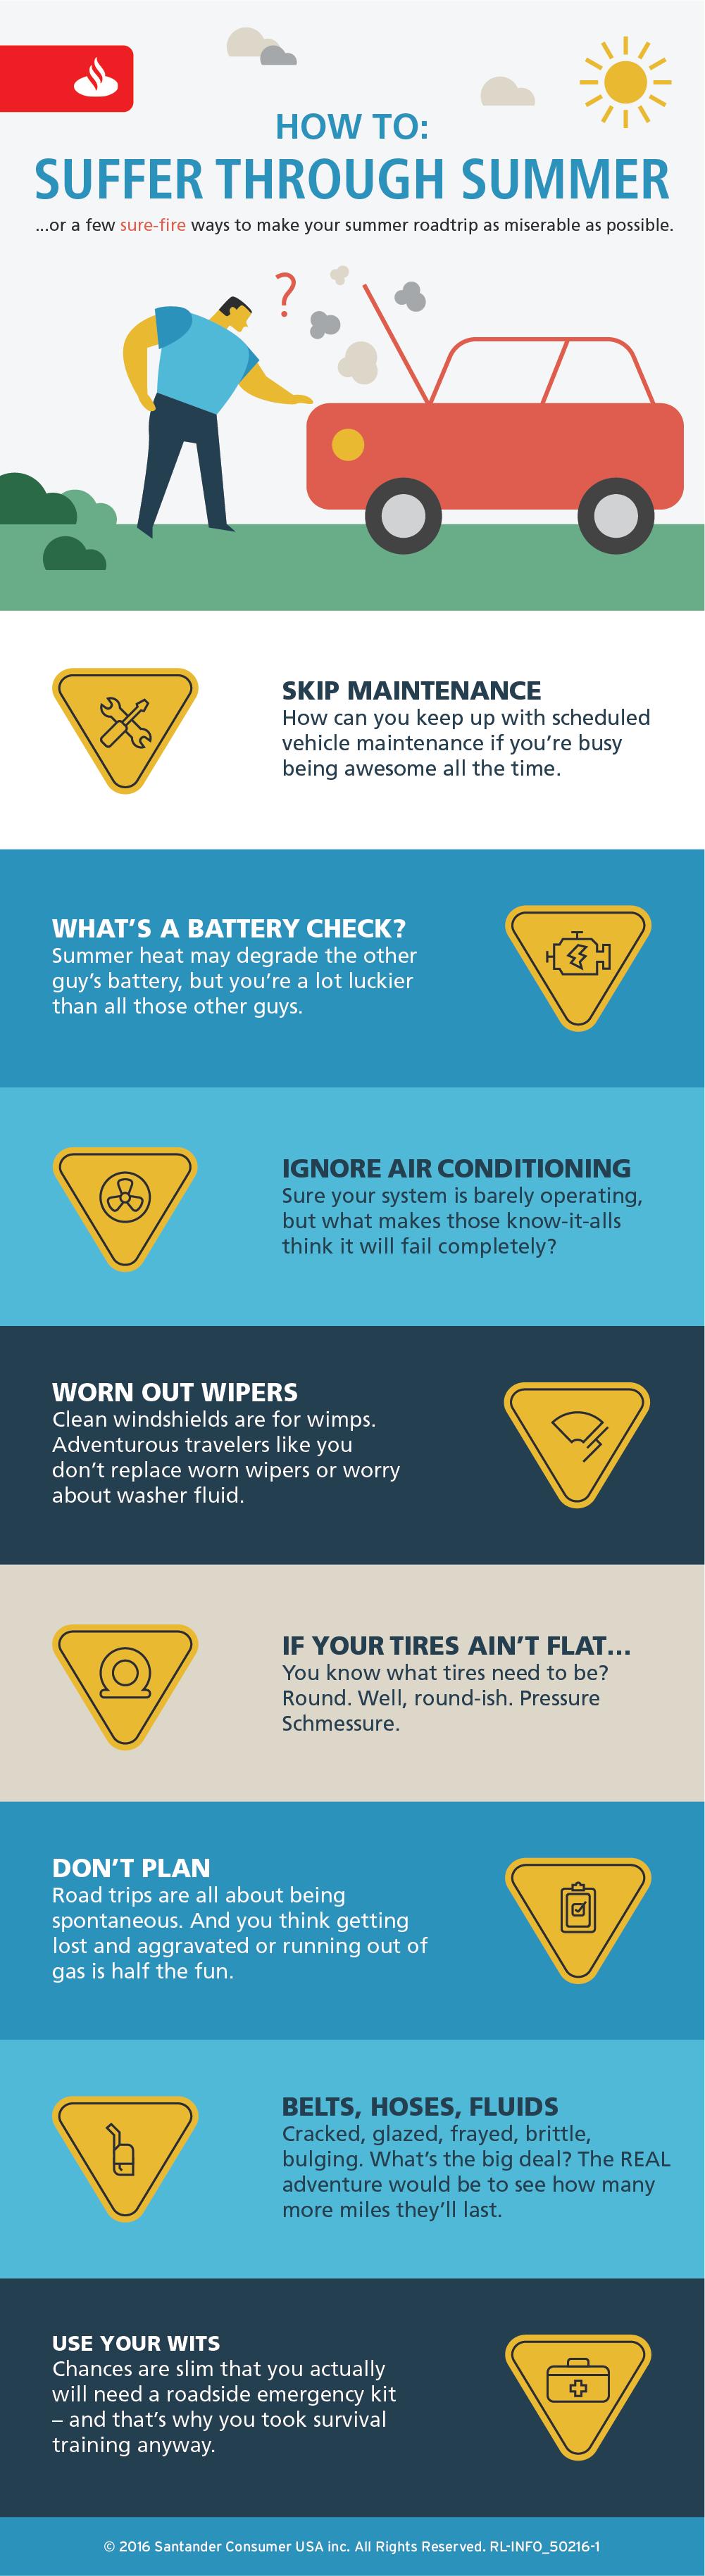 RL-INFO_50216-1 (Suffer thru Summer Infographic)v2